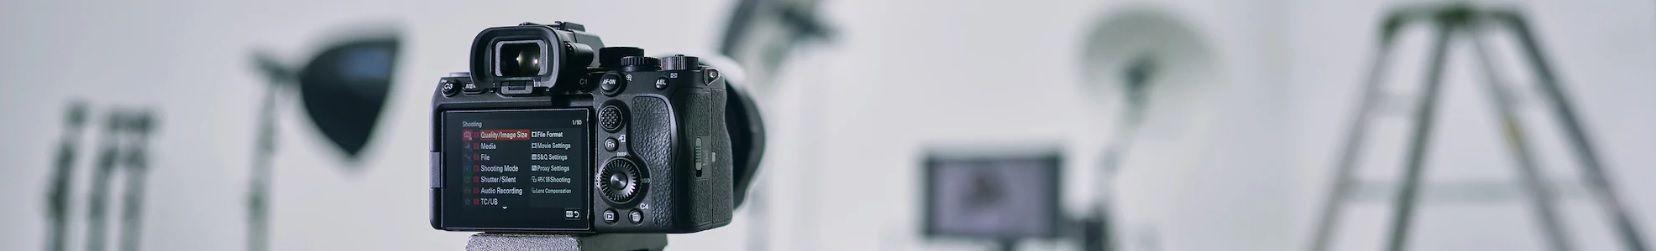 Sony Alpha 7S III - boîtier nu image 9 | Rakuten